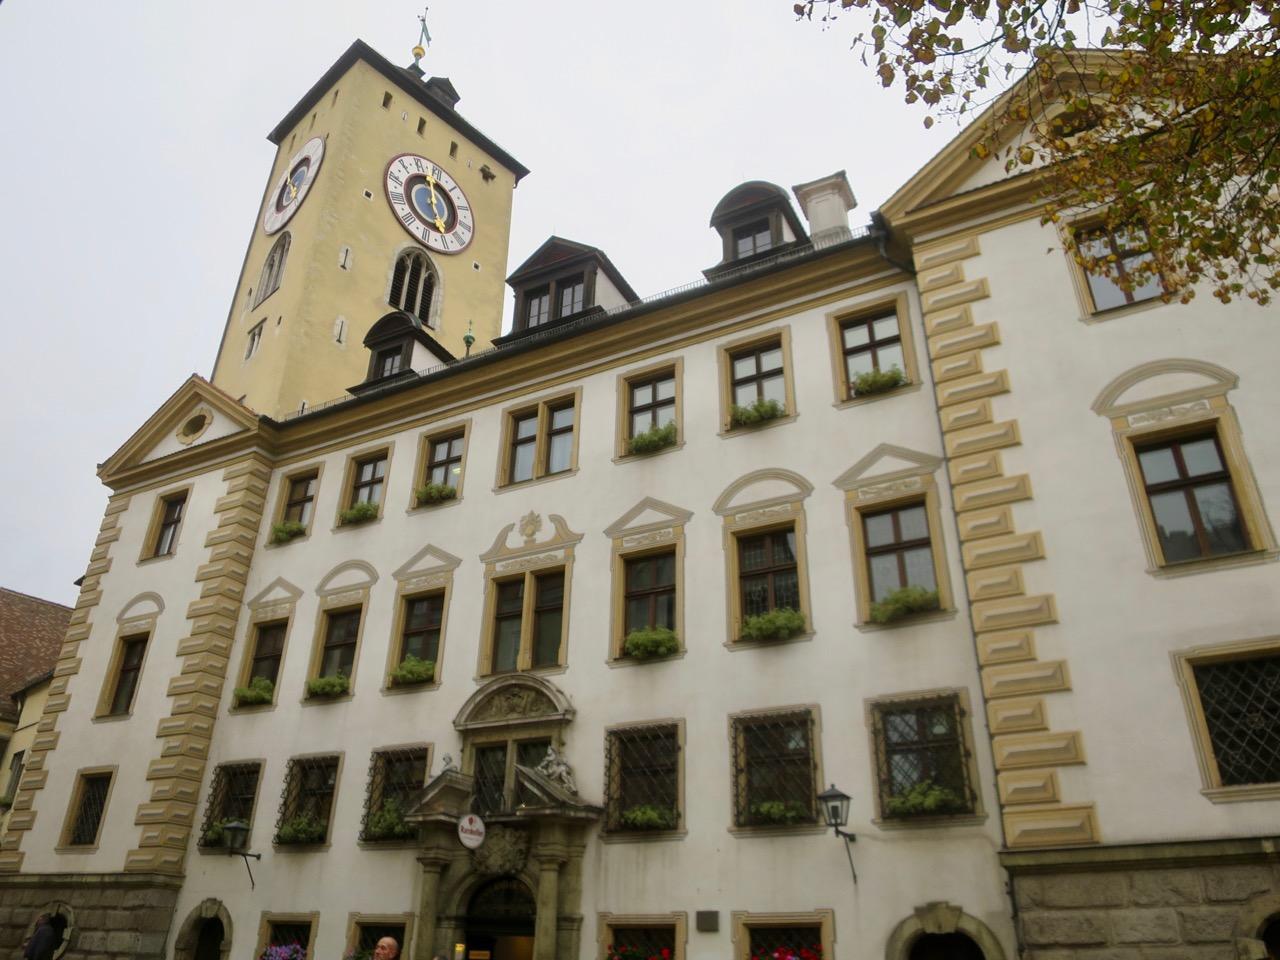 Regensburg 1 27